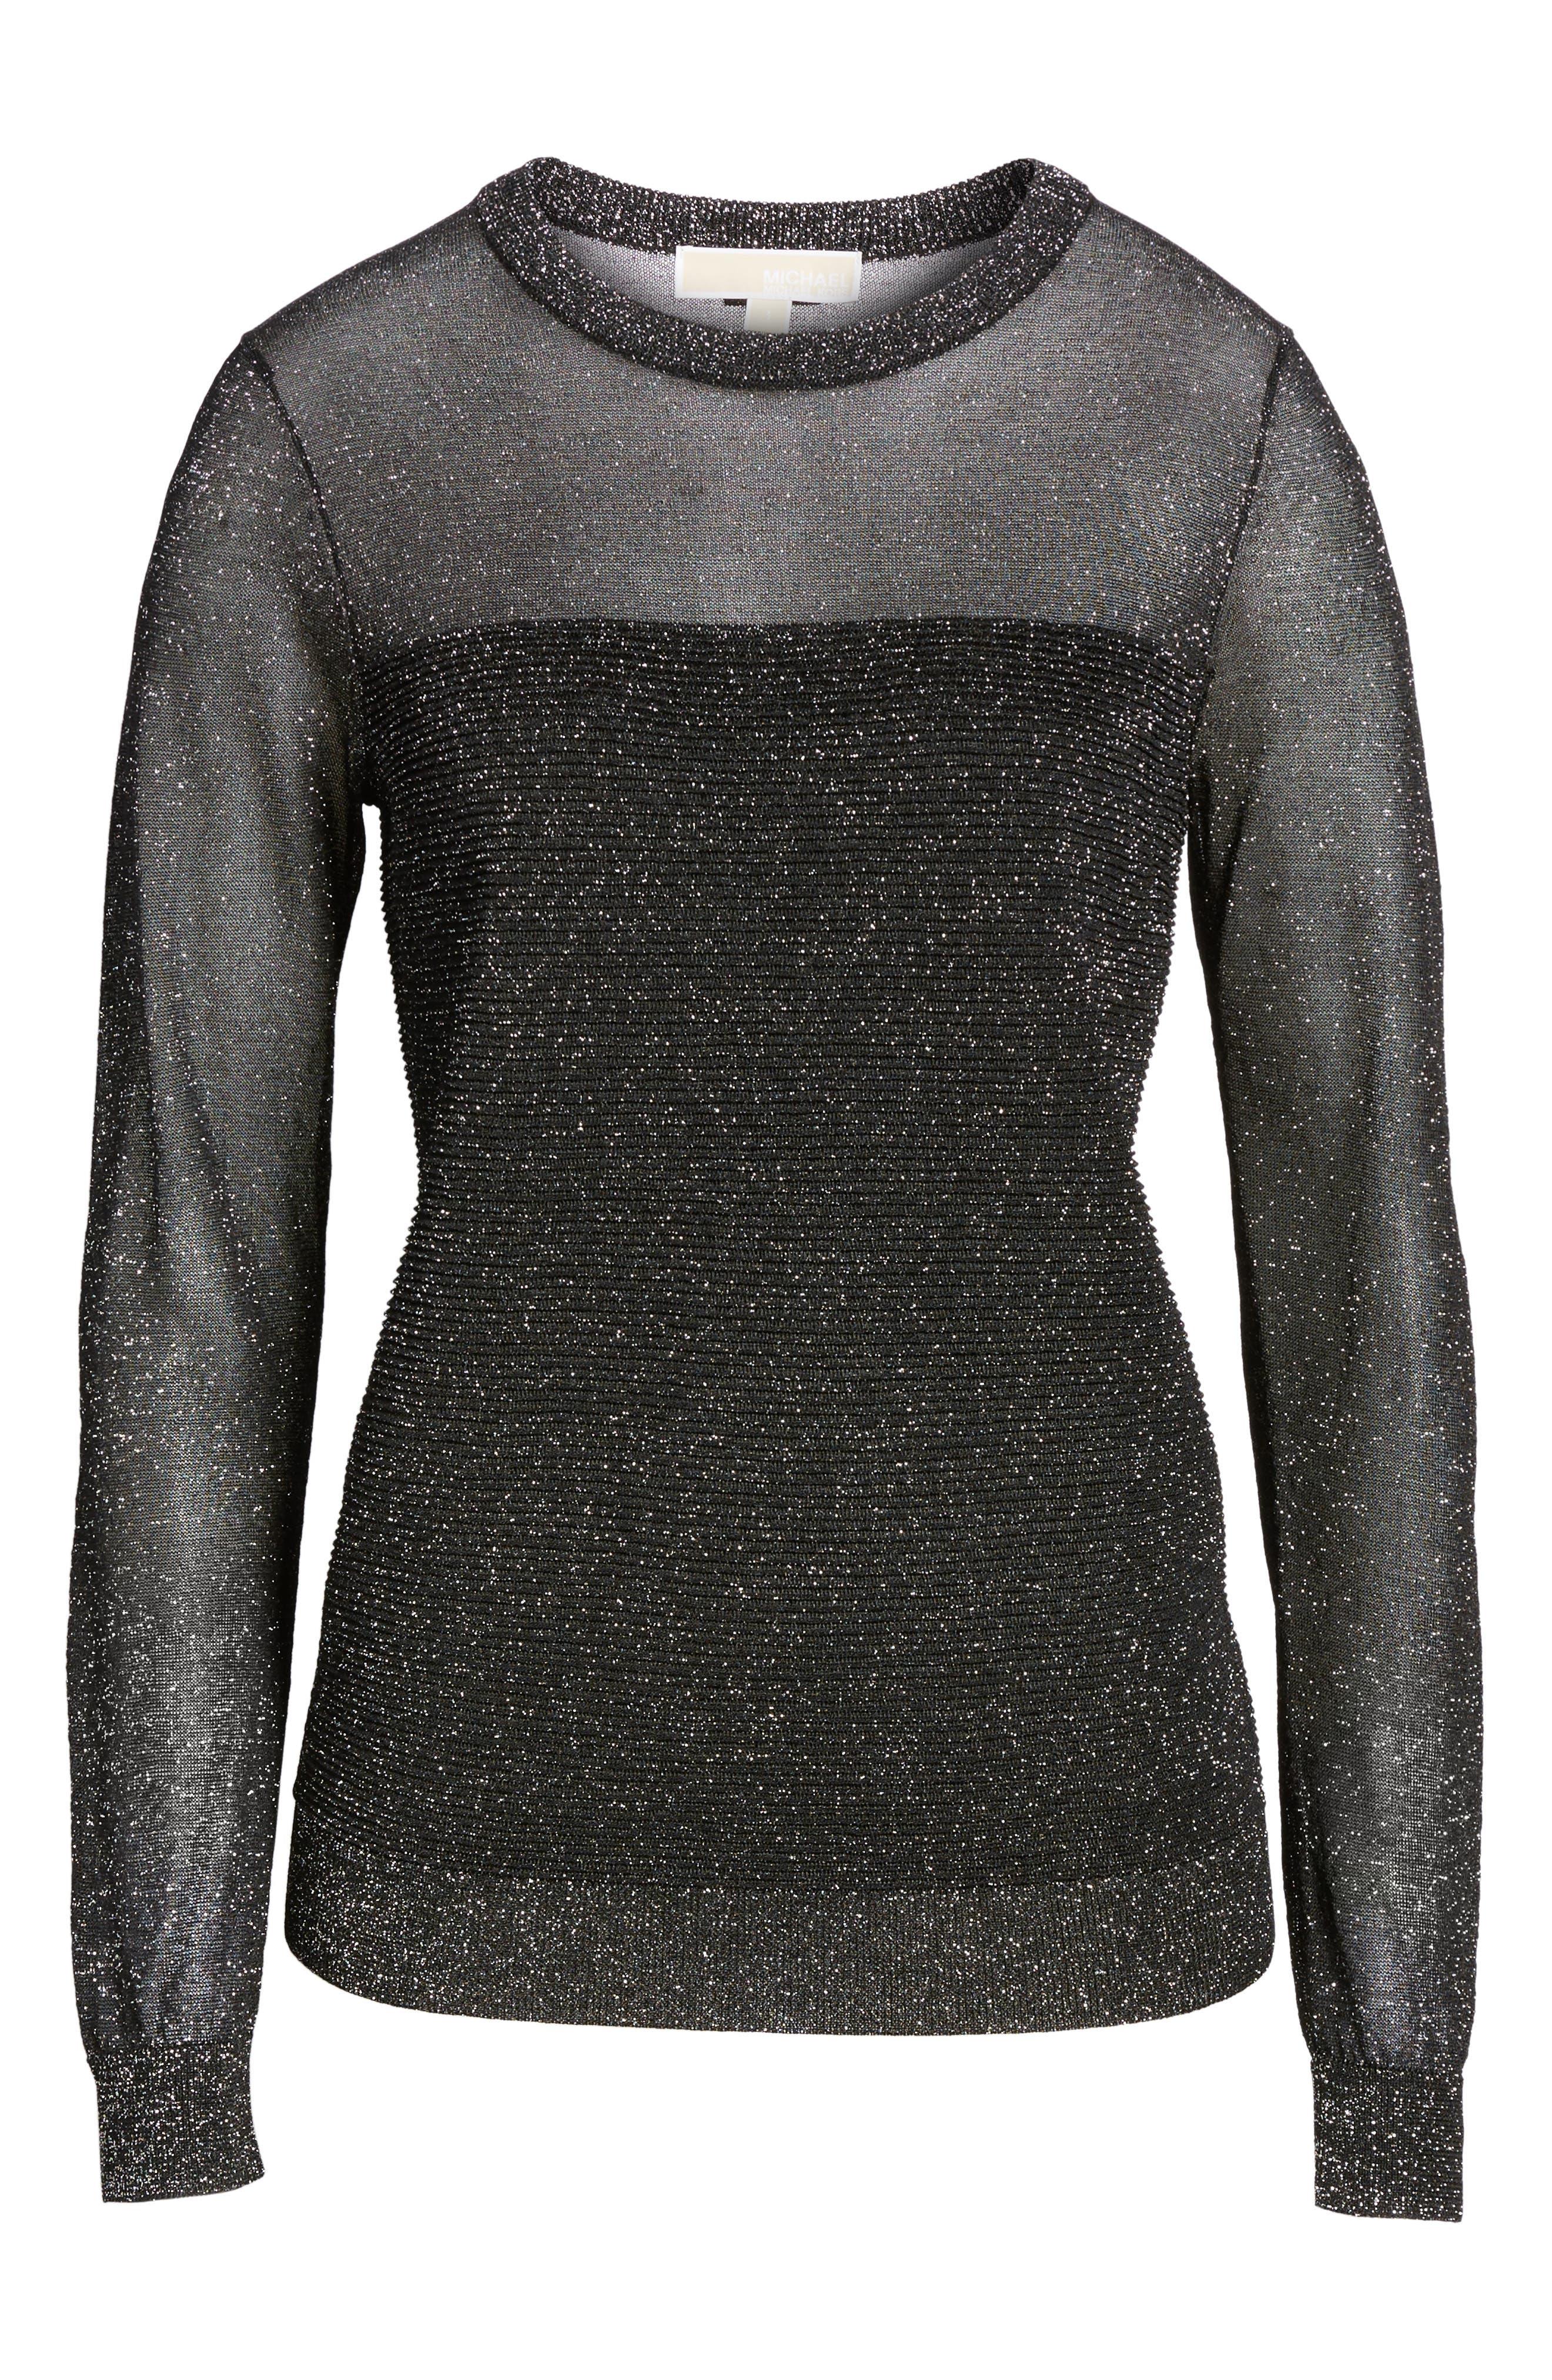 Sheer Metallic Overlay Sweater,                             Alternate thumbnail 6, color,                             001